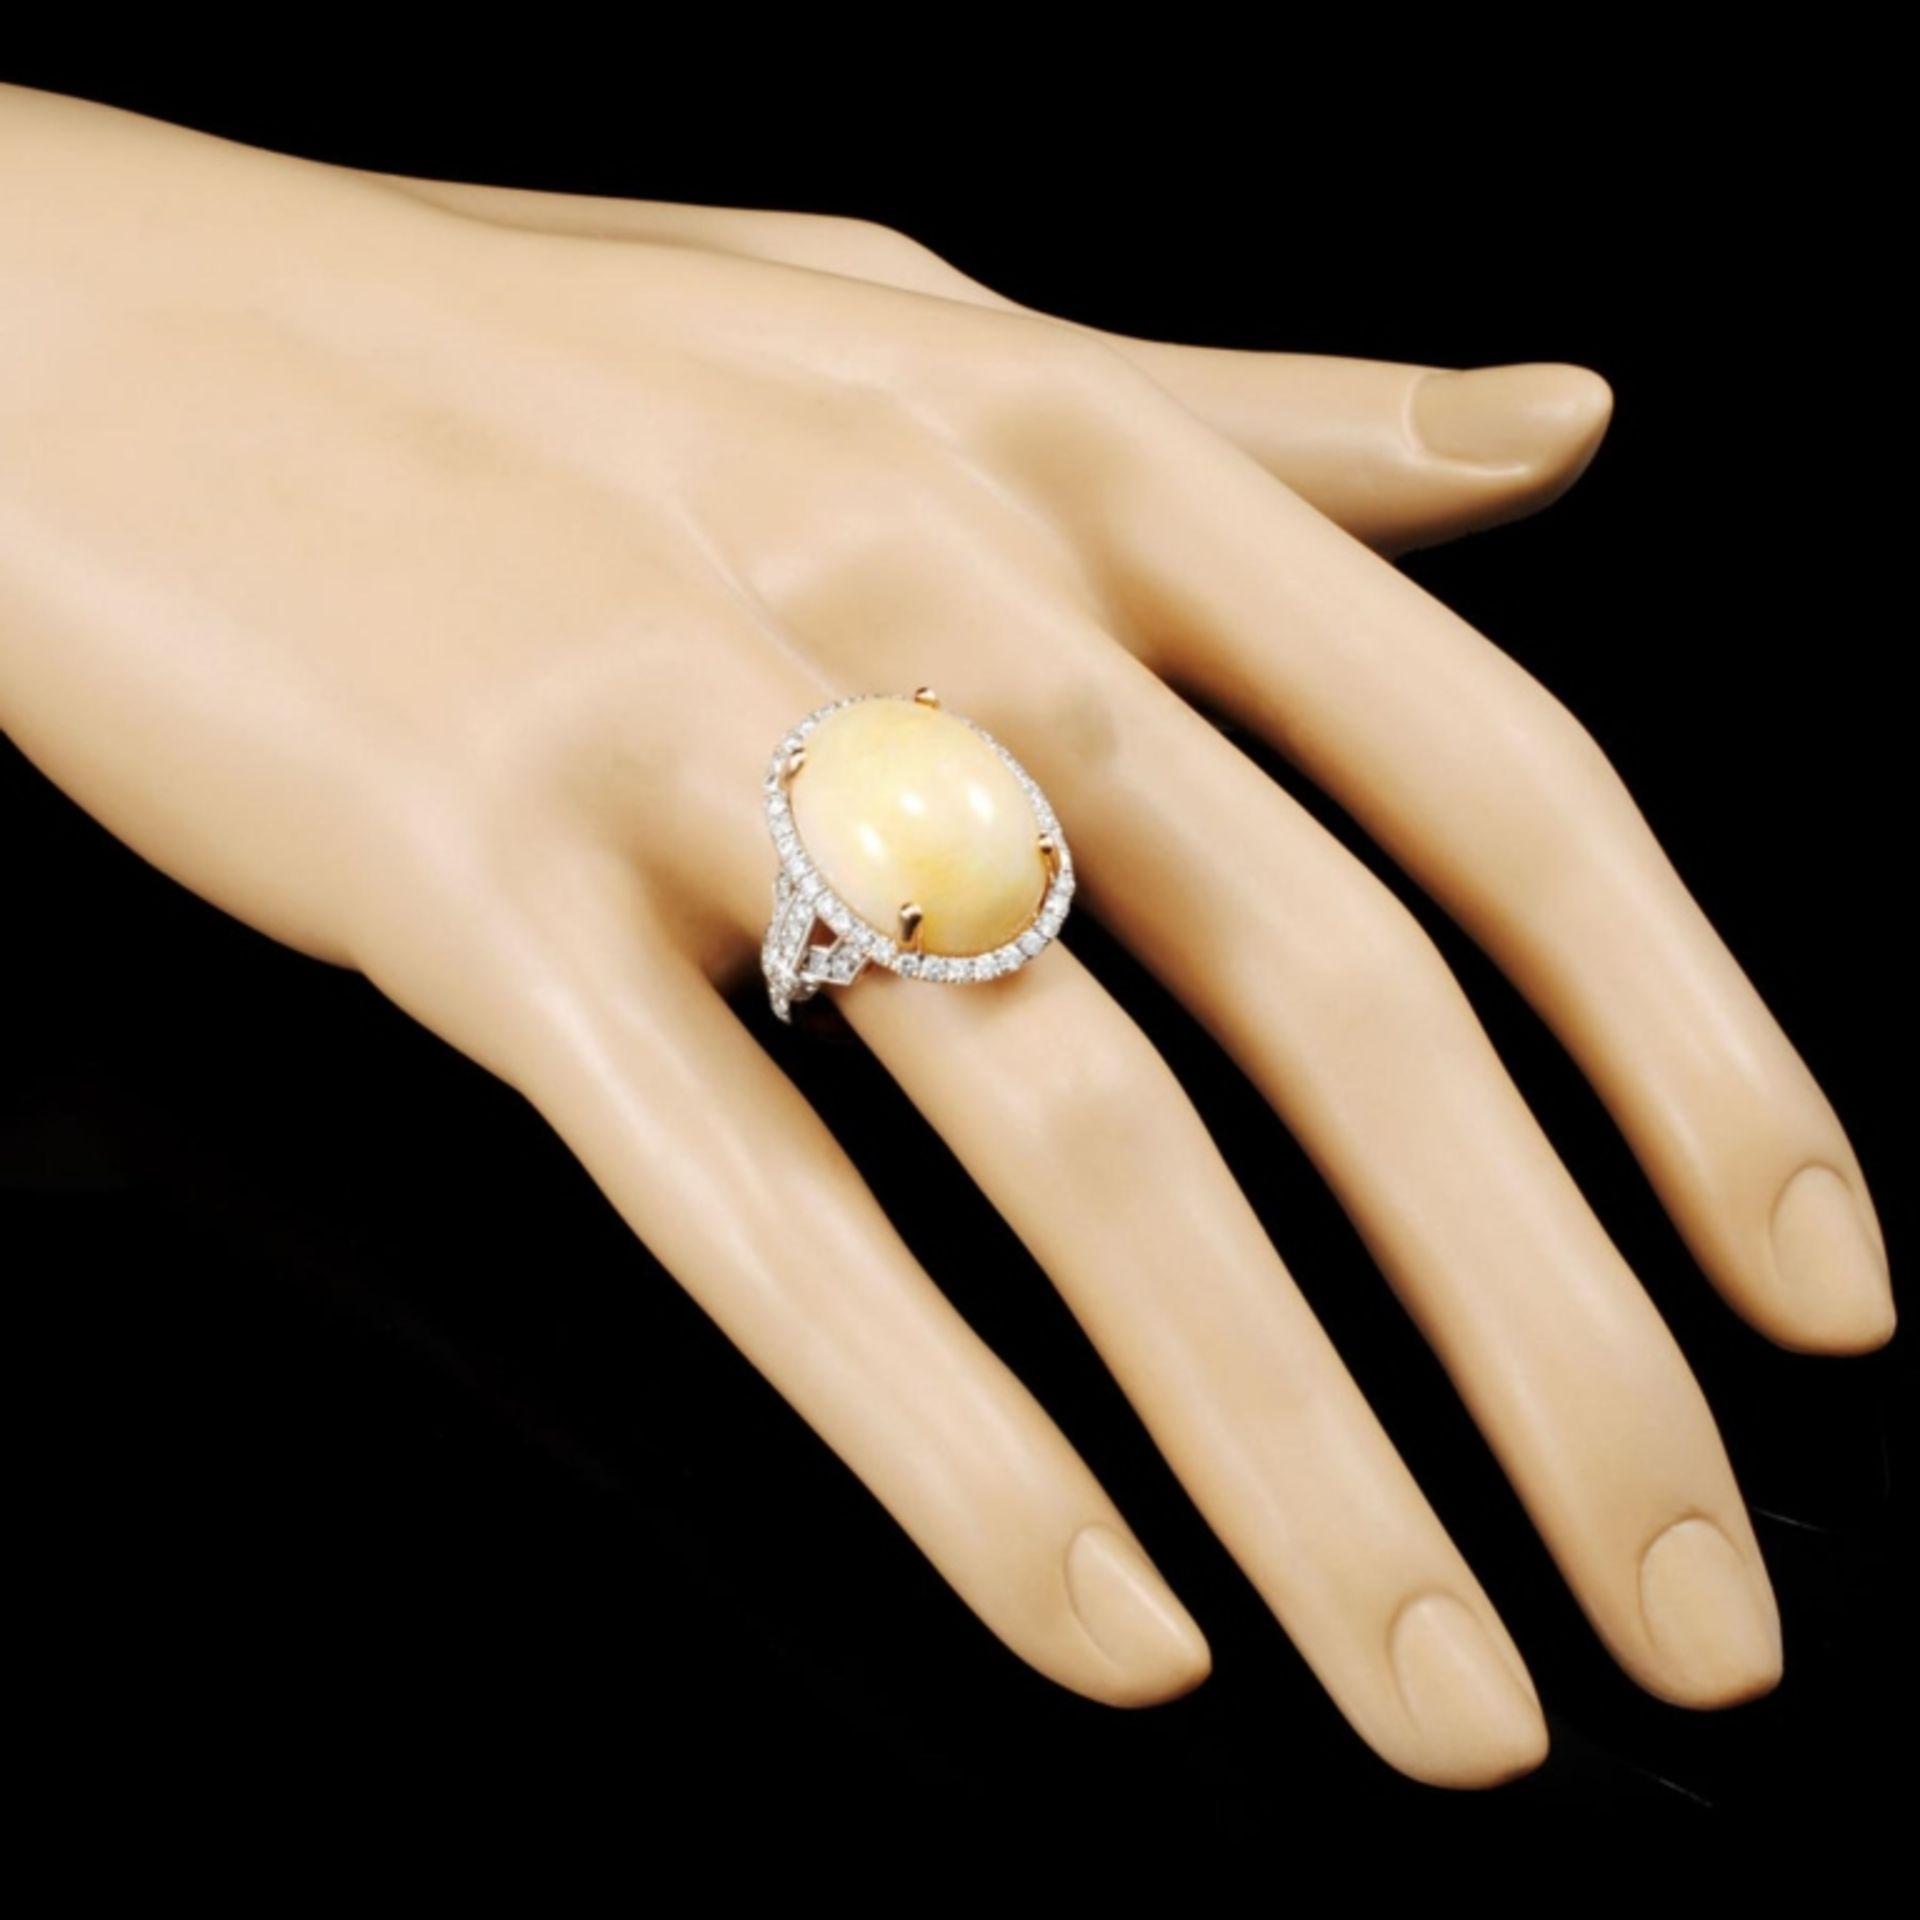 14K Gold 12.04ct Opal & 1.06ctw Diamond Ring - Image 3 of 5